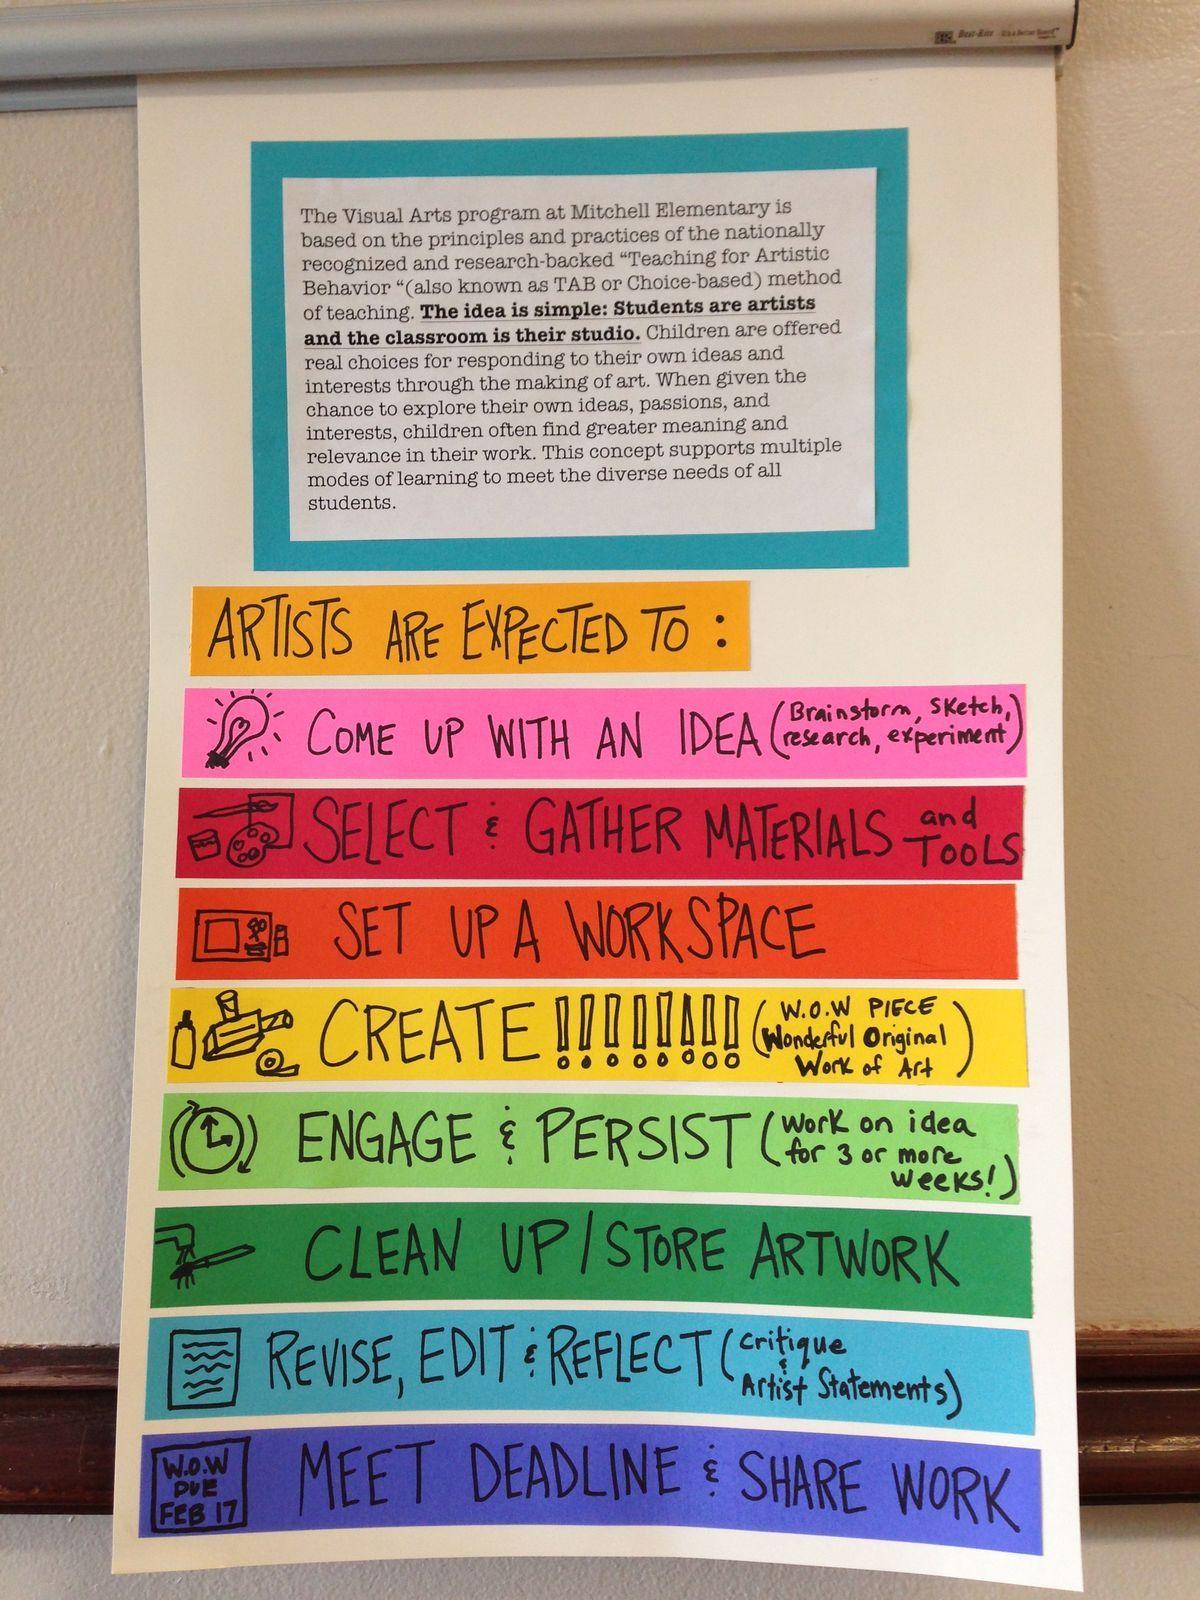 Pin by Kristy Tartaglia on Teaching! | Art classroom management, Art